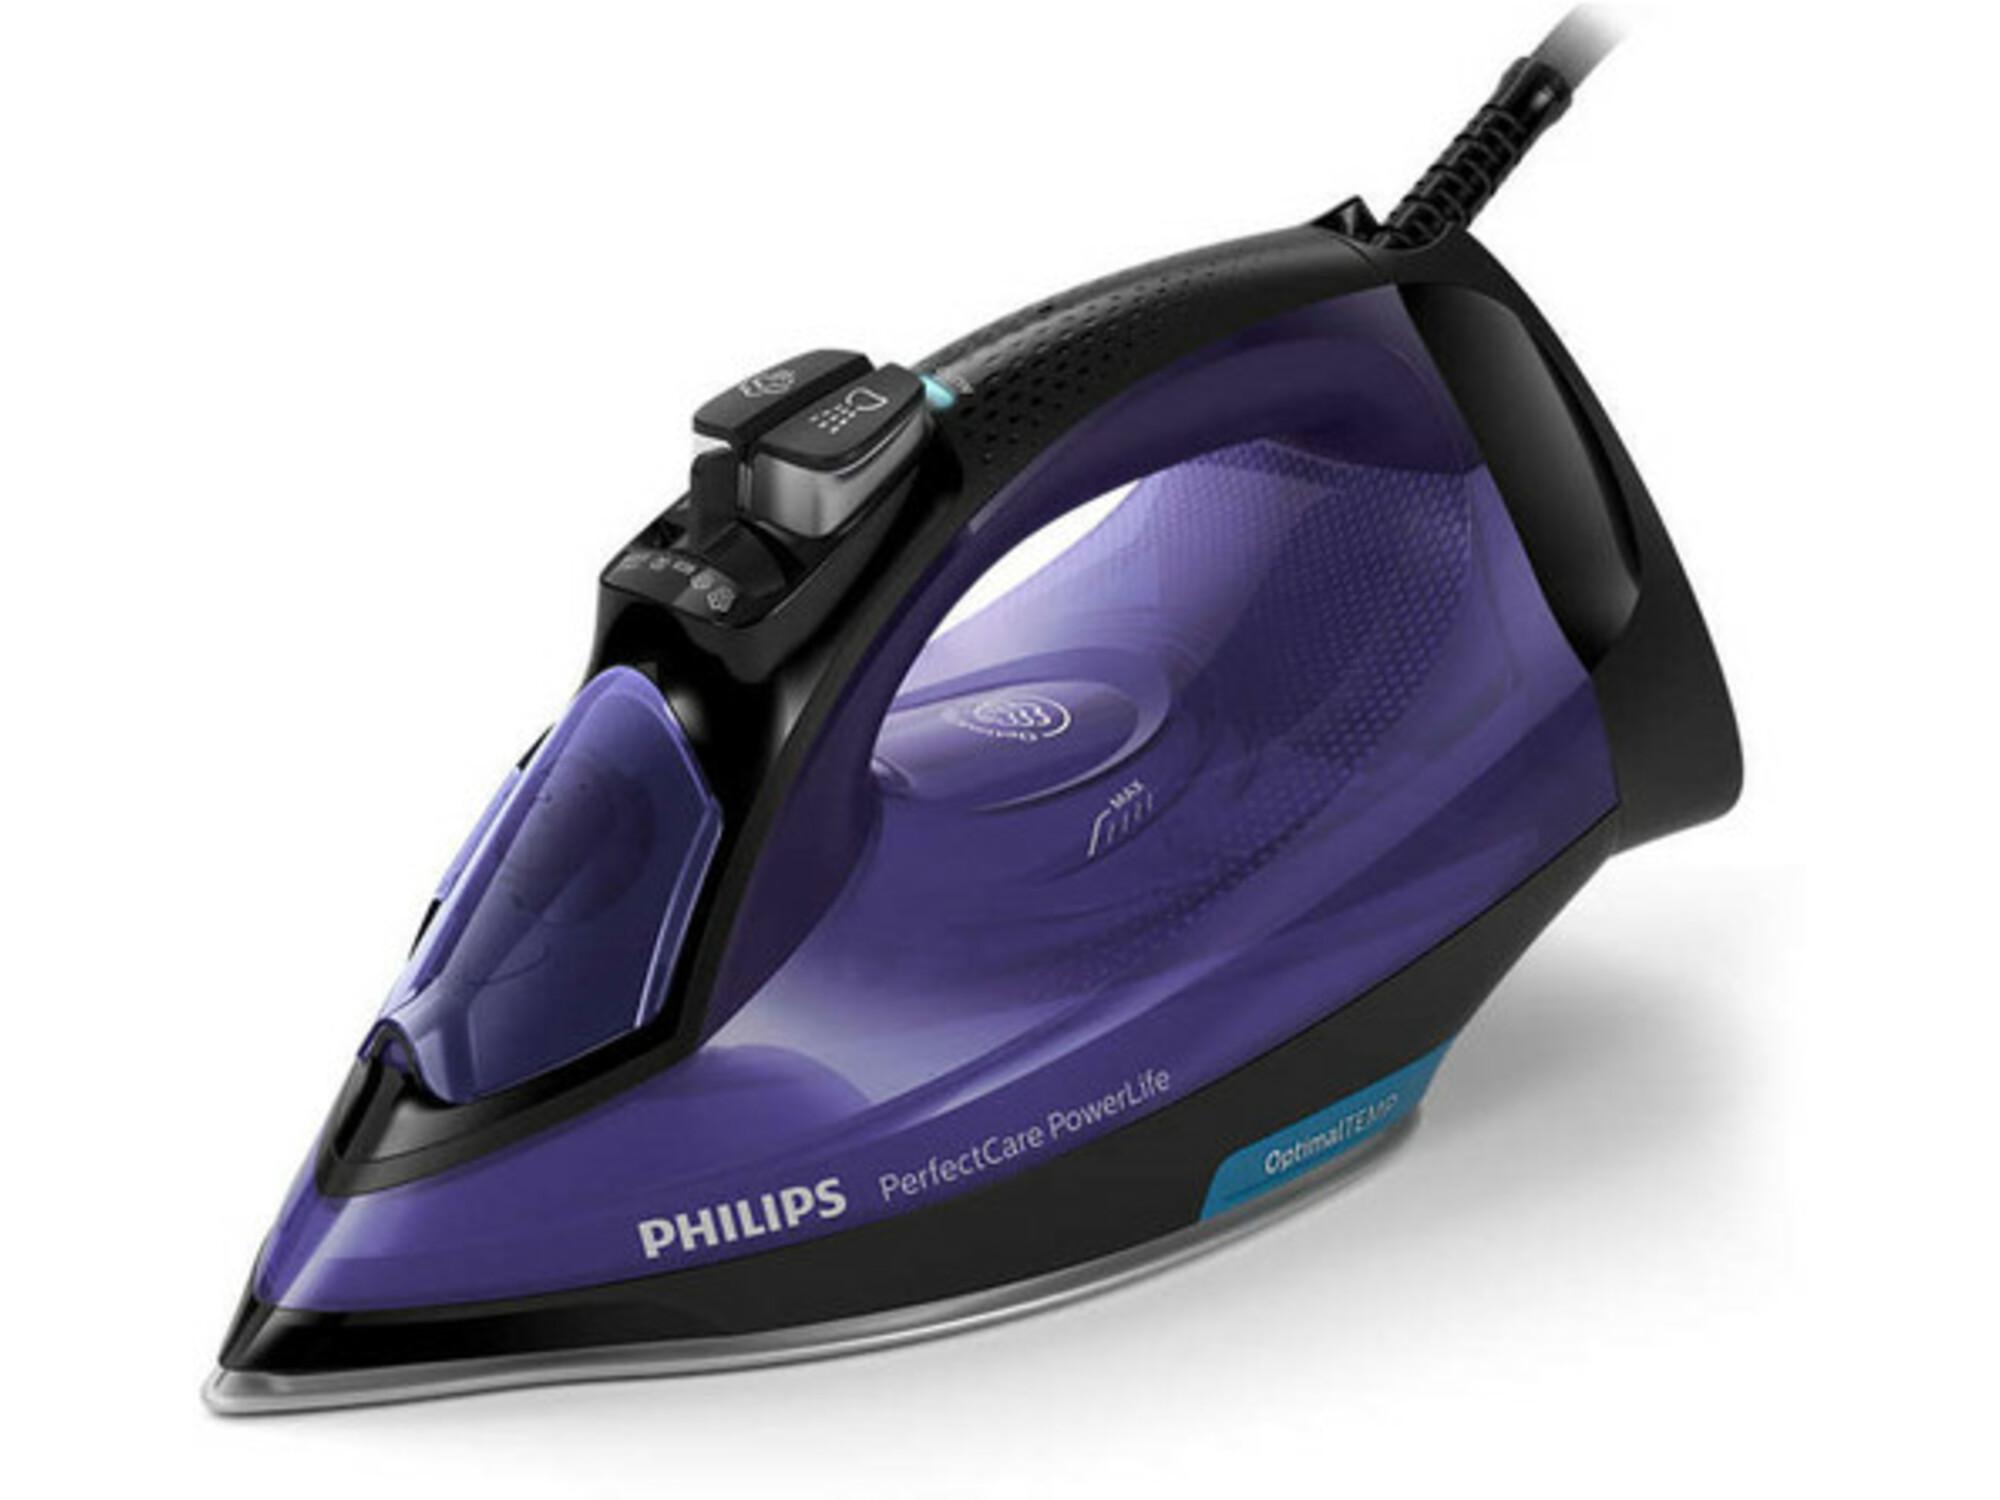 Philips Pegla PerfectCare GC 3925/30